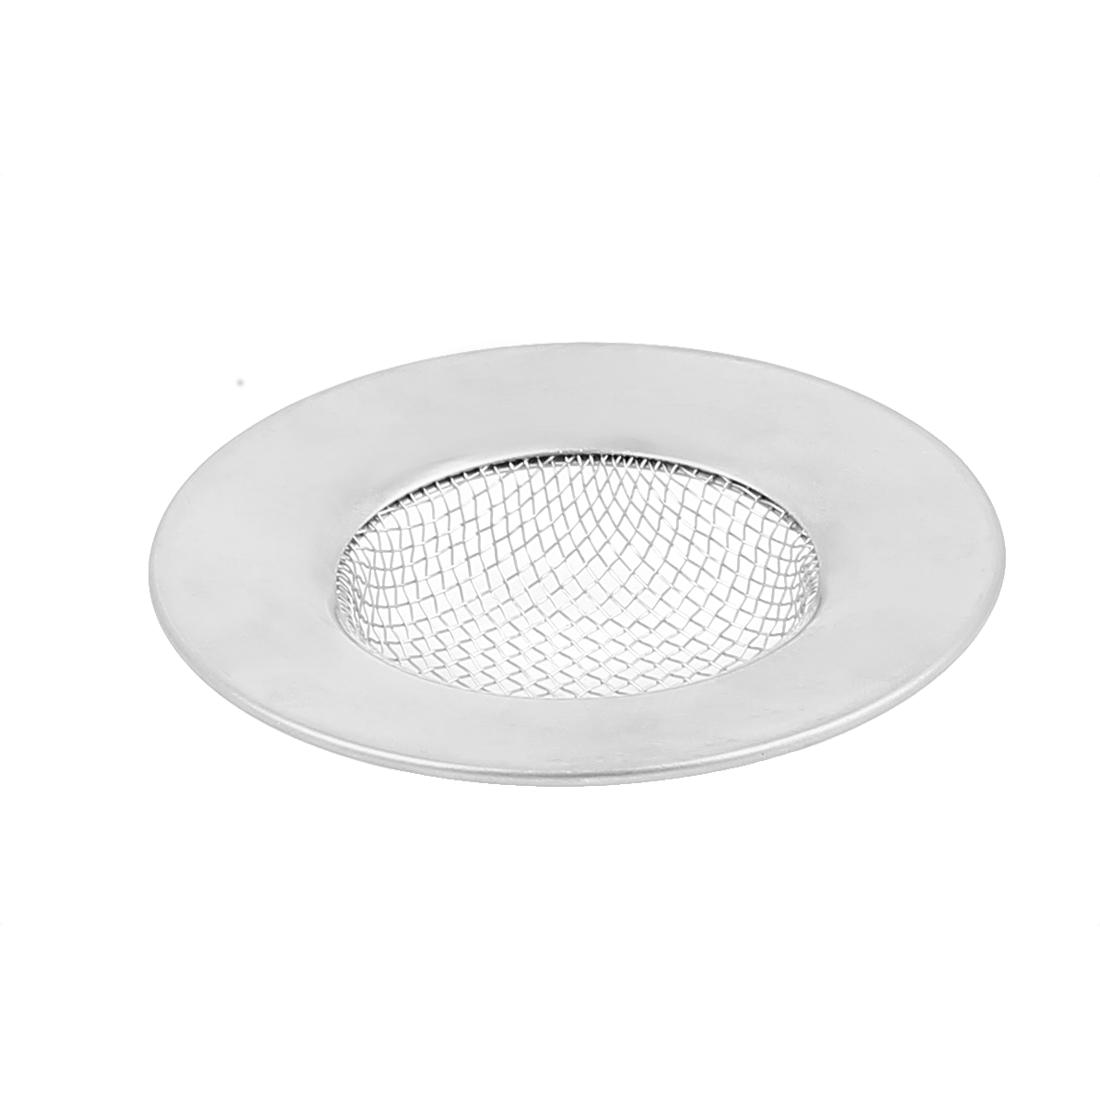 Kitchen Bath Basin Sink Strainer Drain Stopper Silver Tone 2.5 Inch Dia